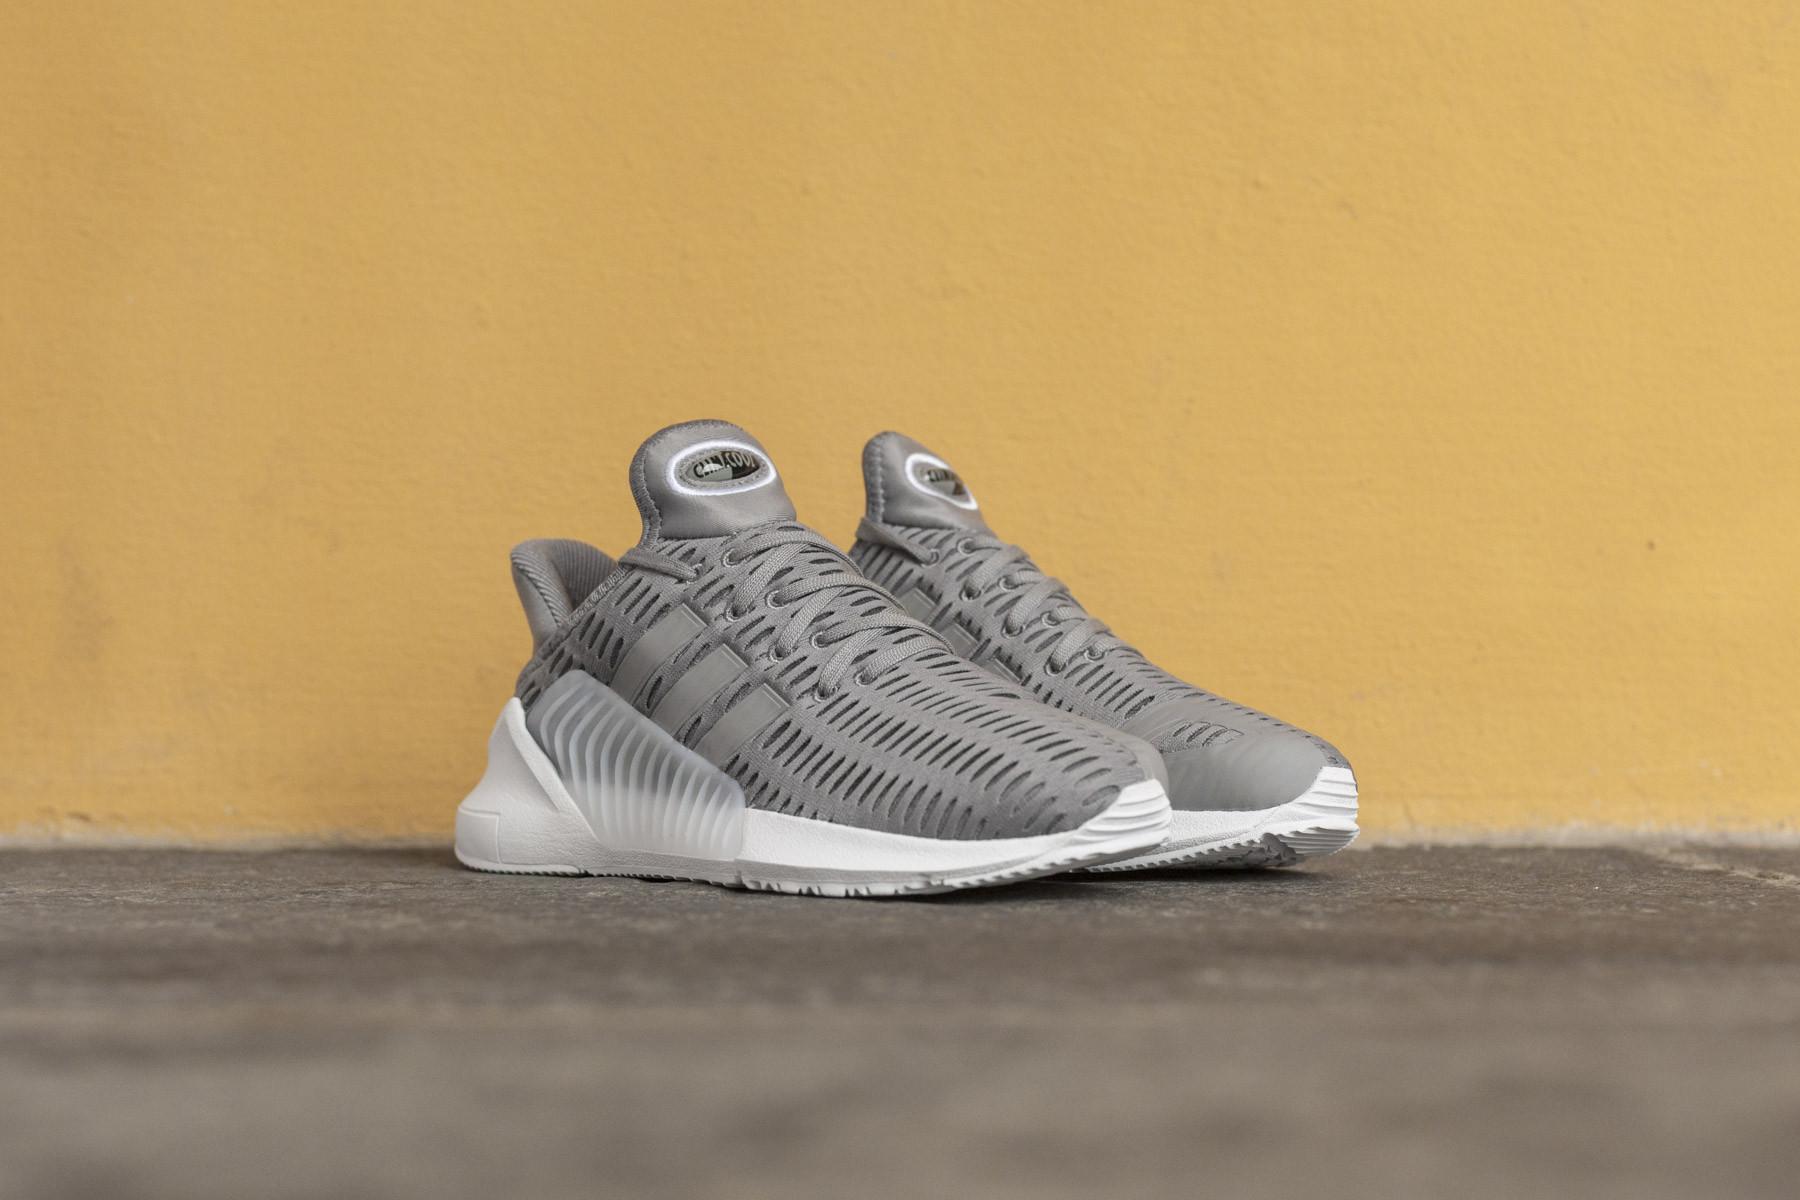 f3298c1e4 мужские кроссовки Adidas Climacool 02/17 Grey / White (артикул 8830)